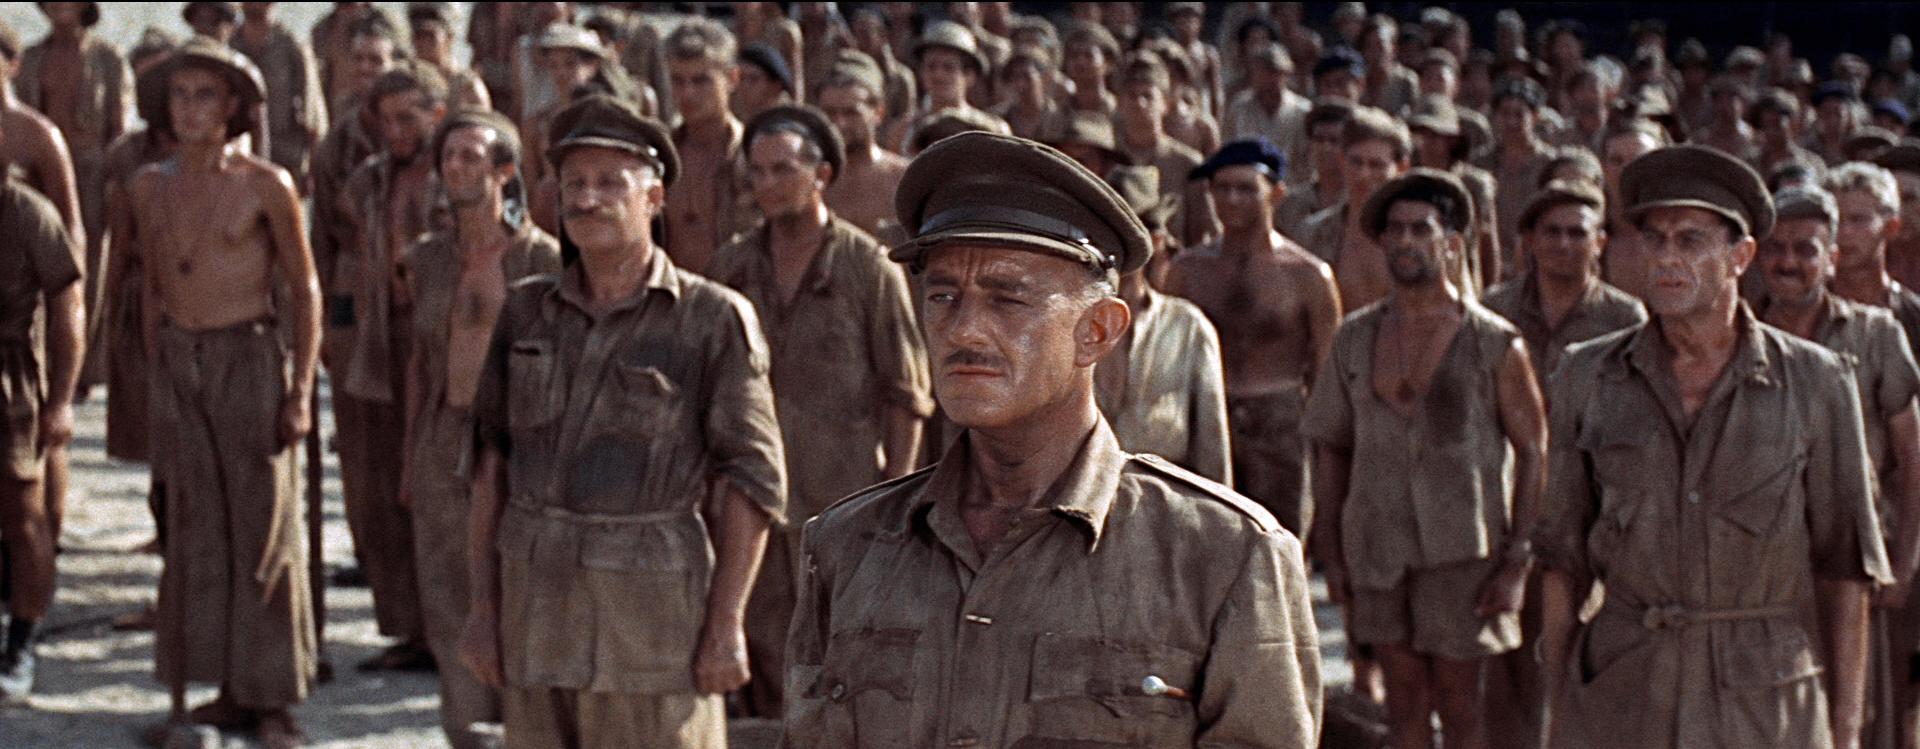 Top 250 фильмов IMDb Мост через реку Квай (The Bridge on the River Kwai) (1957)